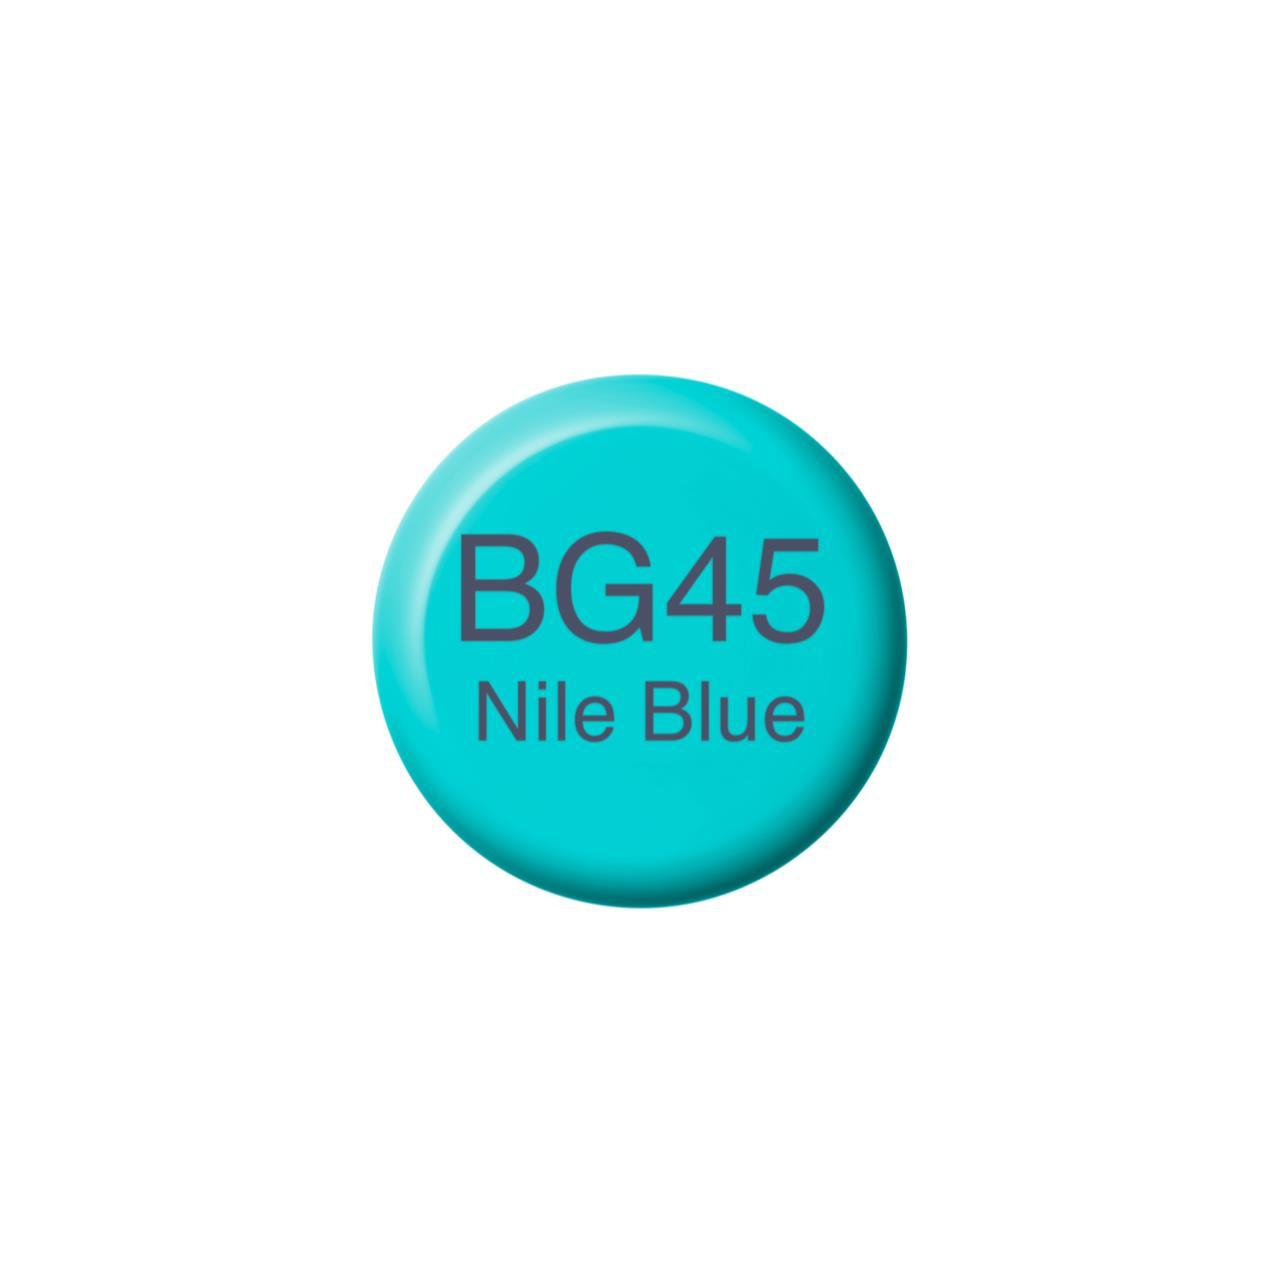 BG45 Nile Blue, Copic Ink - 4511338056301